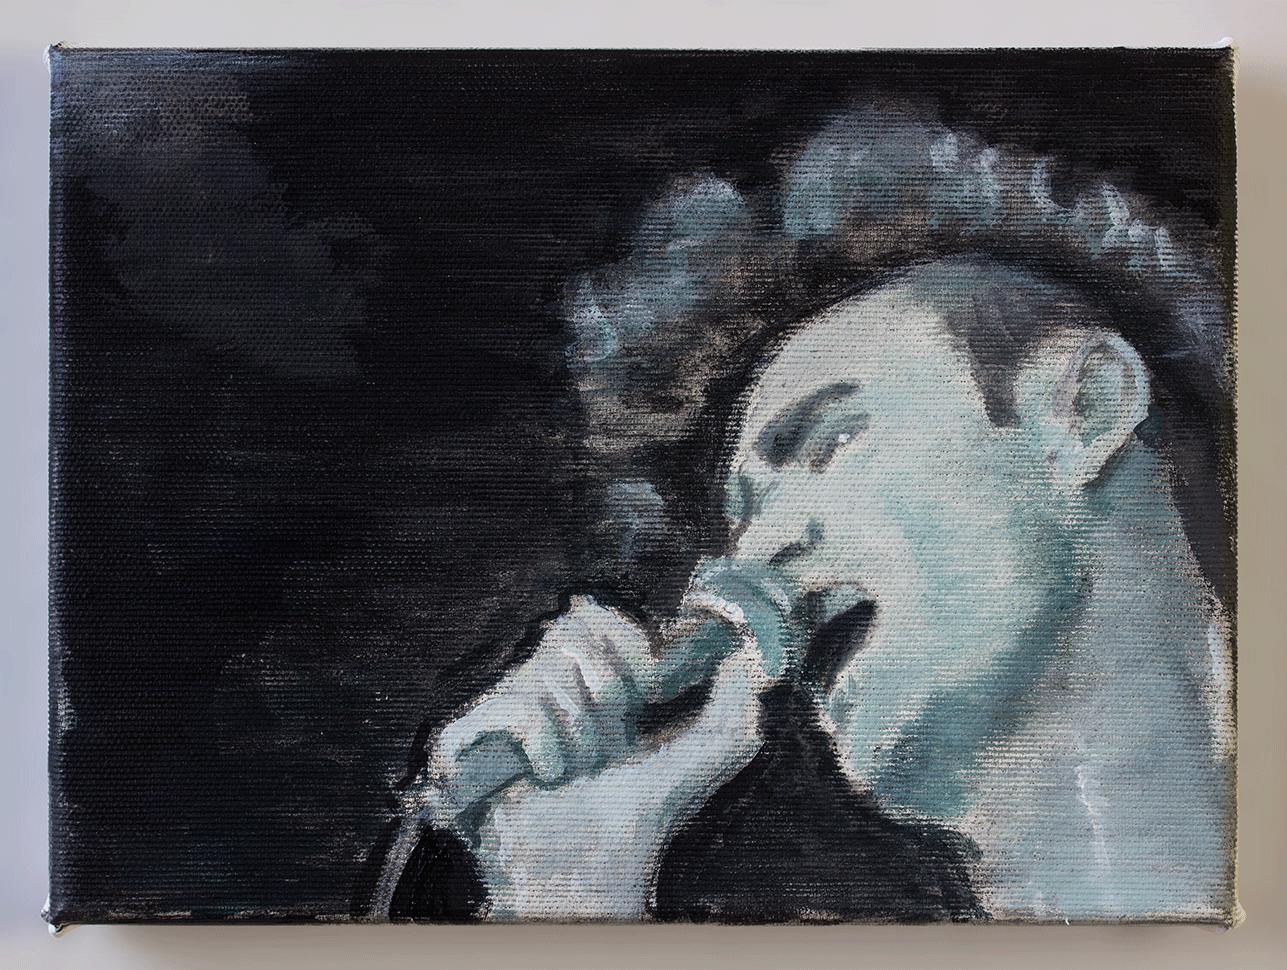 Morrissey 2 2018